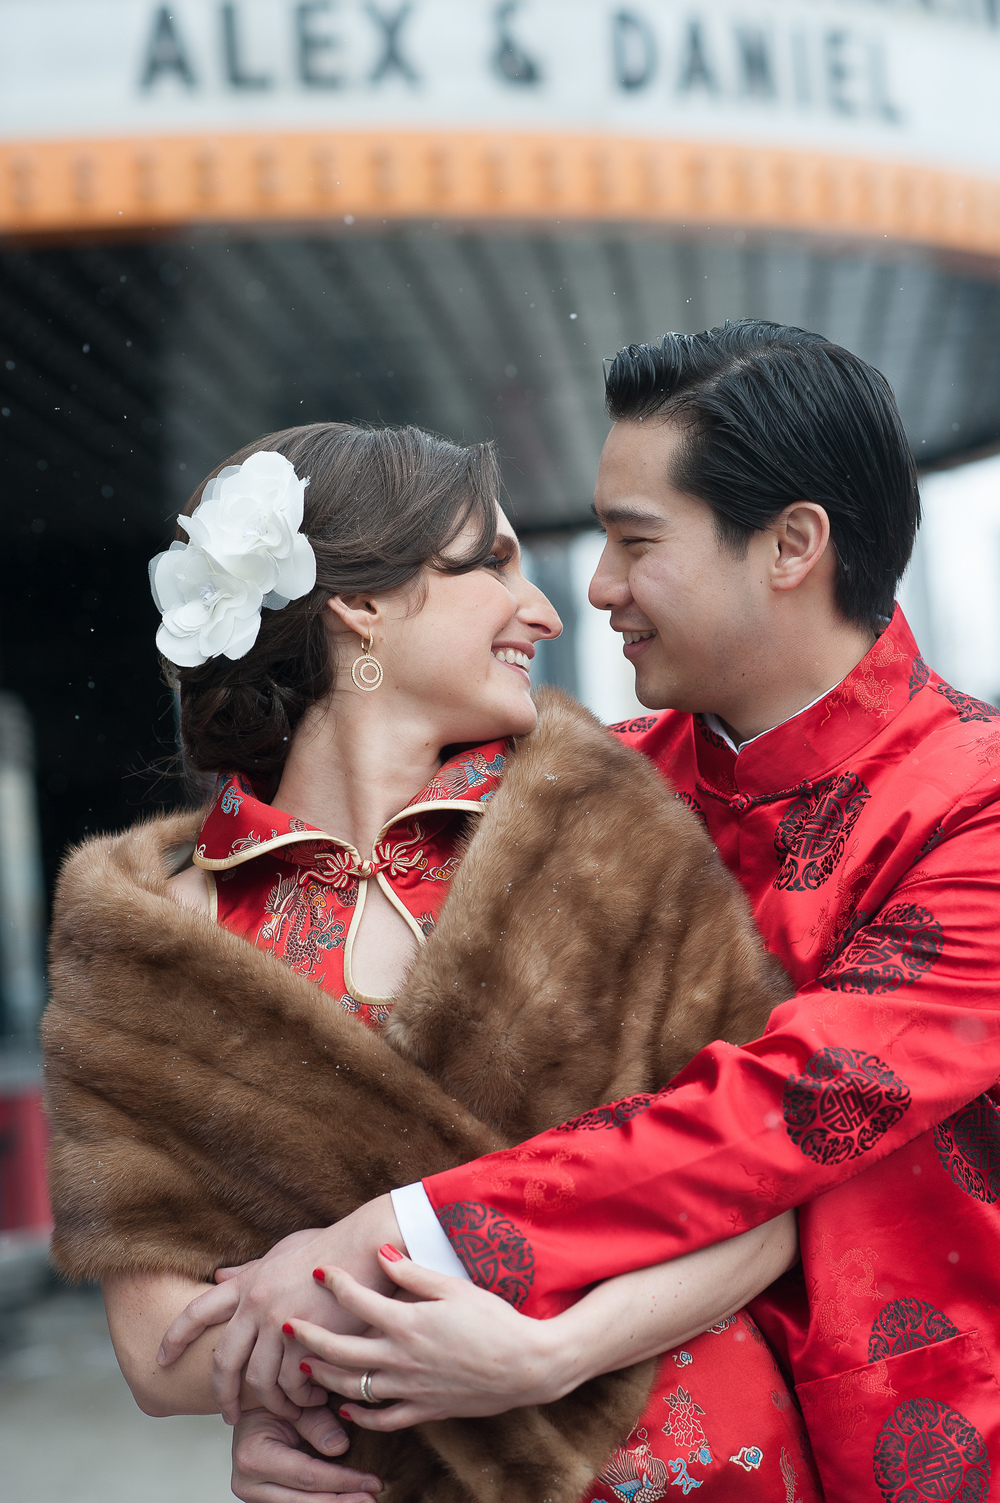 eglinton-grand-wedding-008.jpg